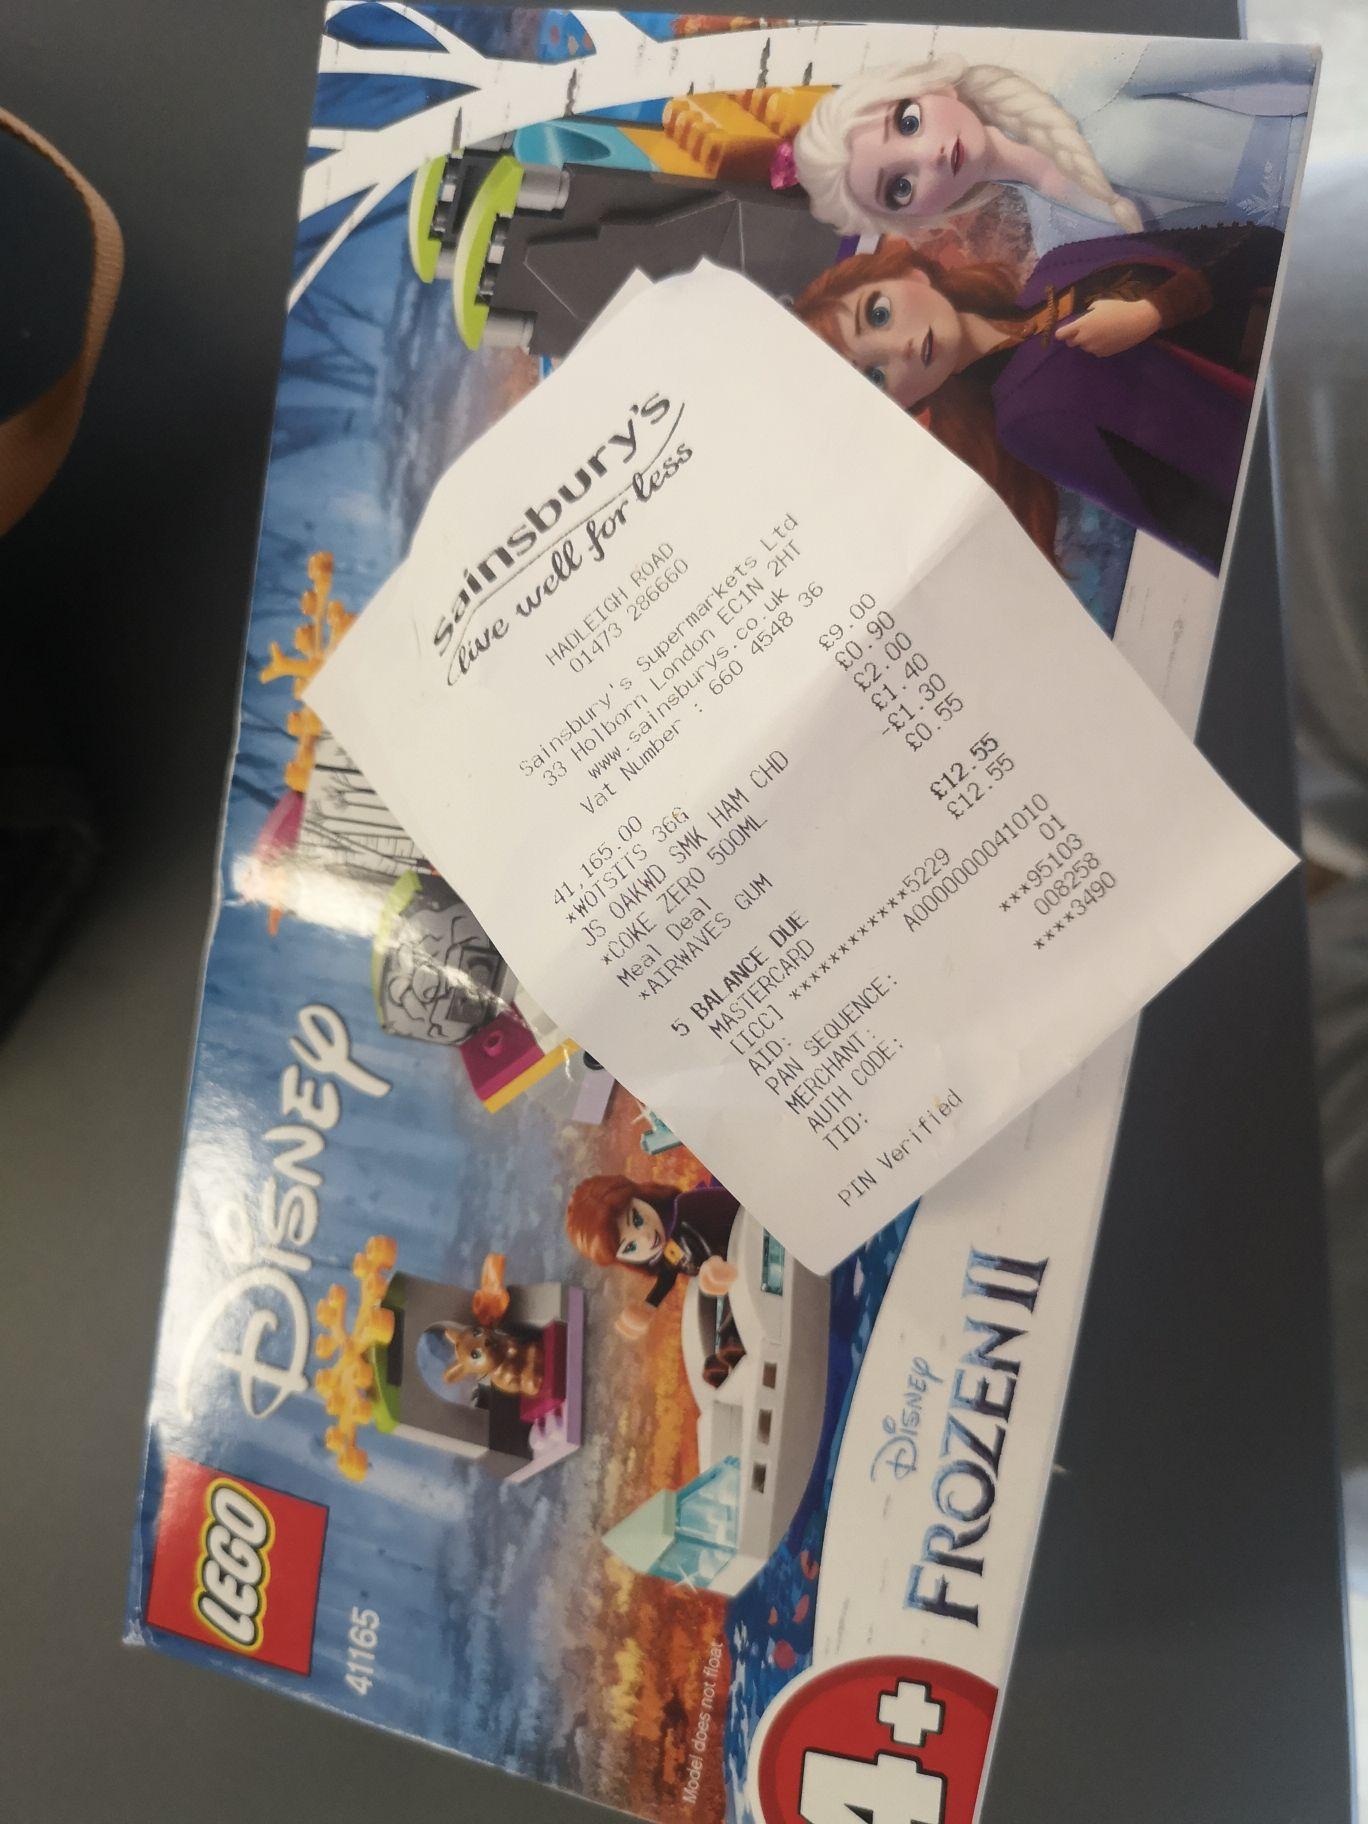 Lego 41165 Disney Frozen II £9 at Sainsbury's Ipswich